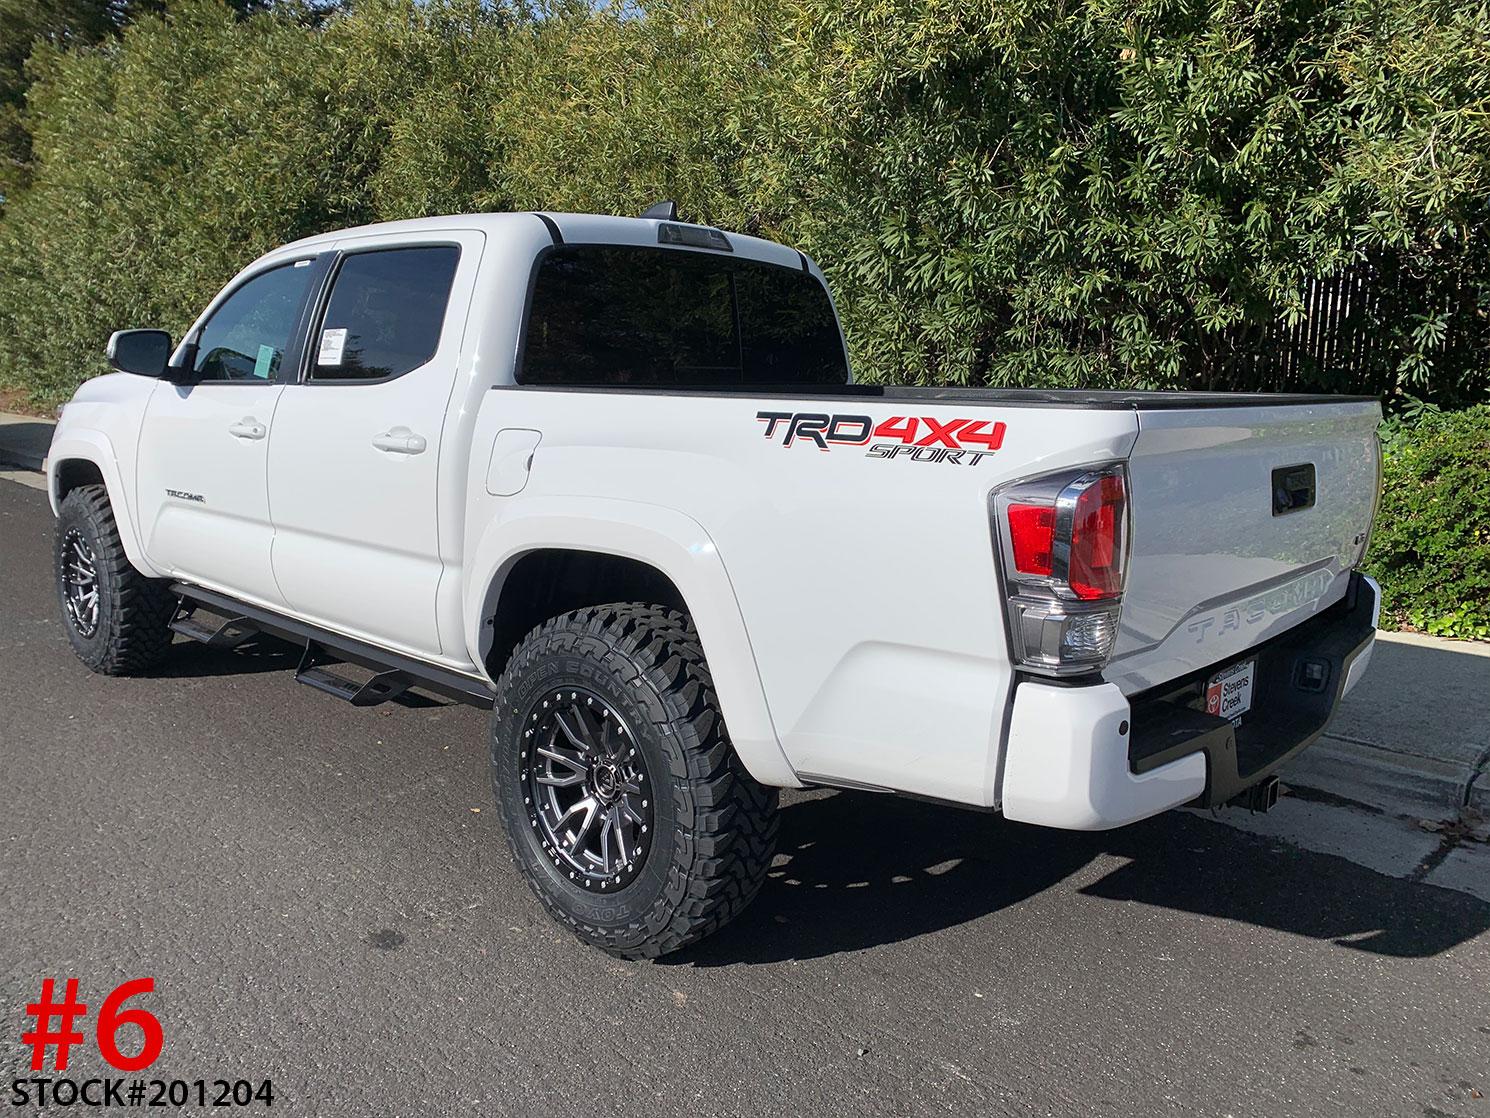 2020 TOYOTA TACOMA CREW CAB #201204